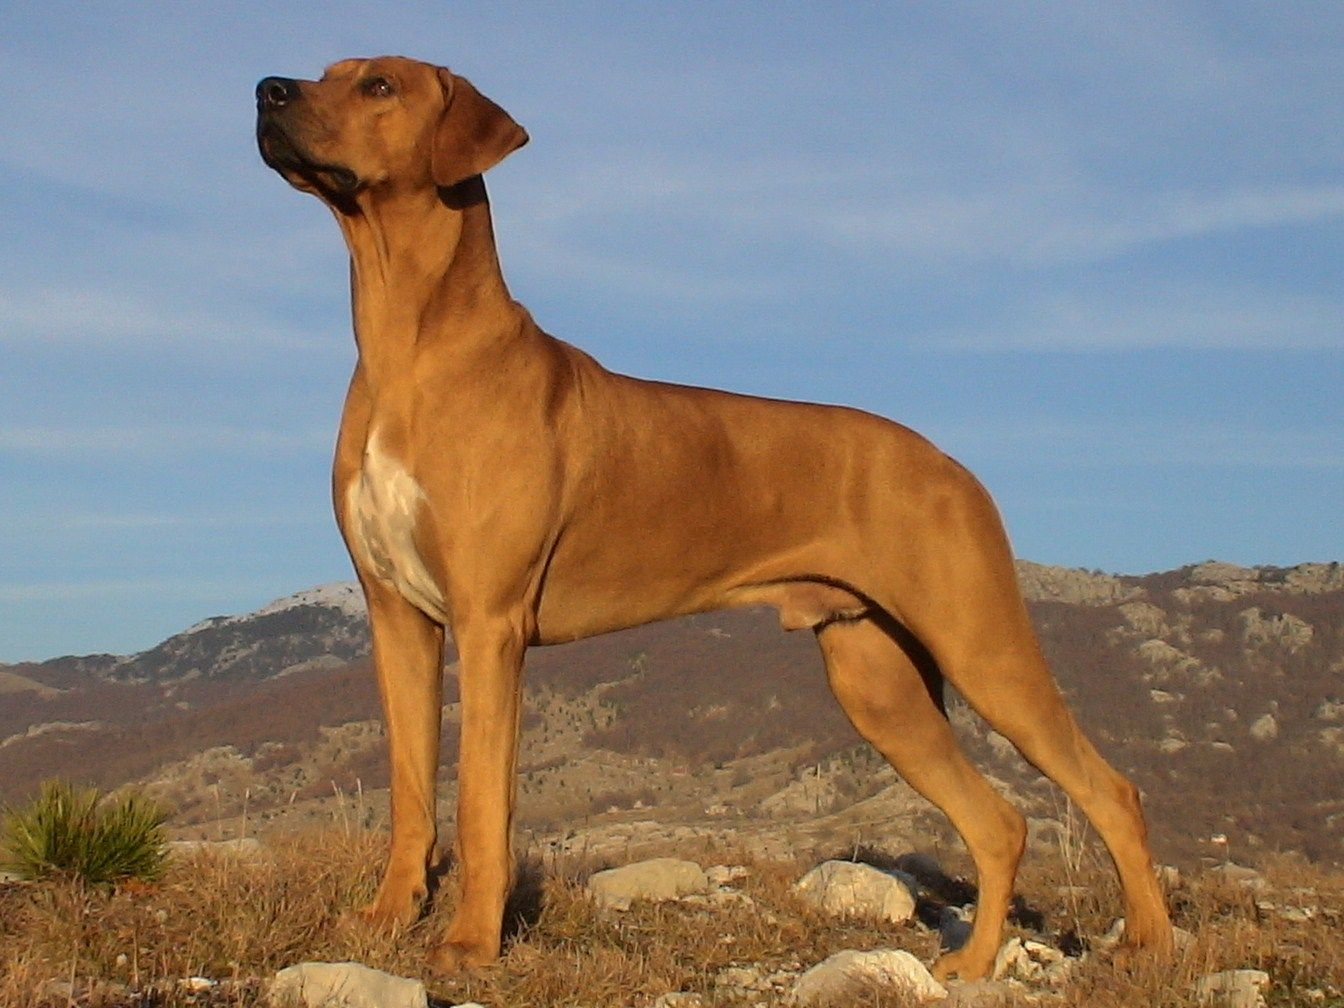 Rhodesian Ridgeback Pose Background Photo Large Dog Breeds Rhodesian Ridgeback Dog Breeds